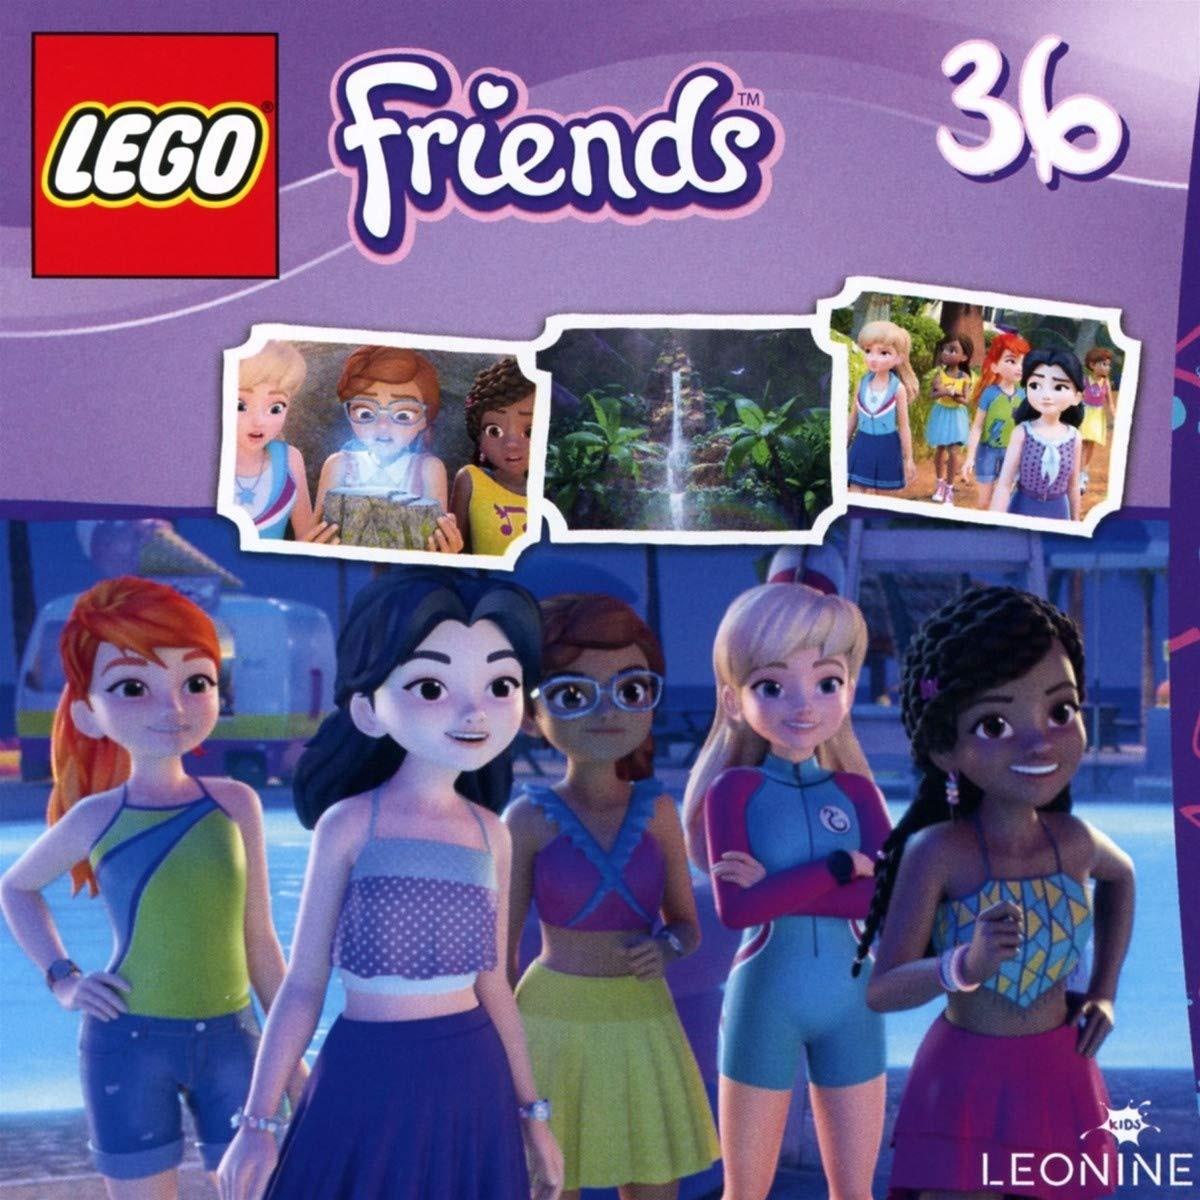 LEGO Friends (CD 36)